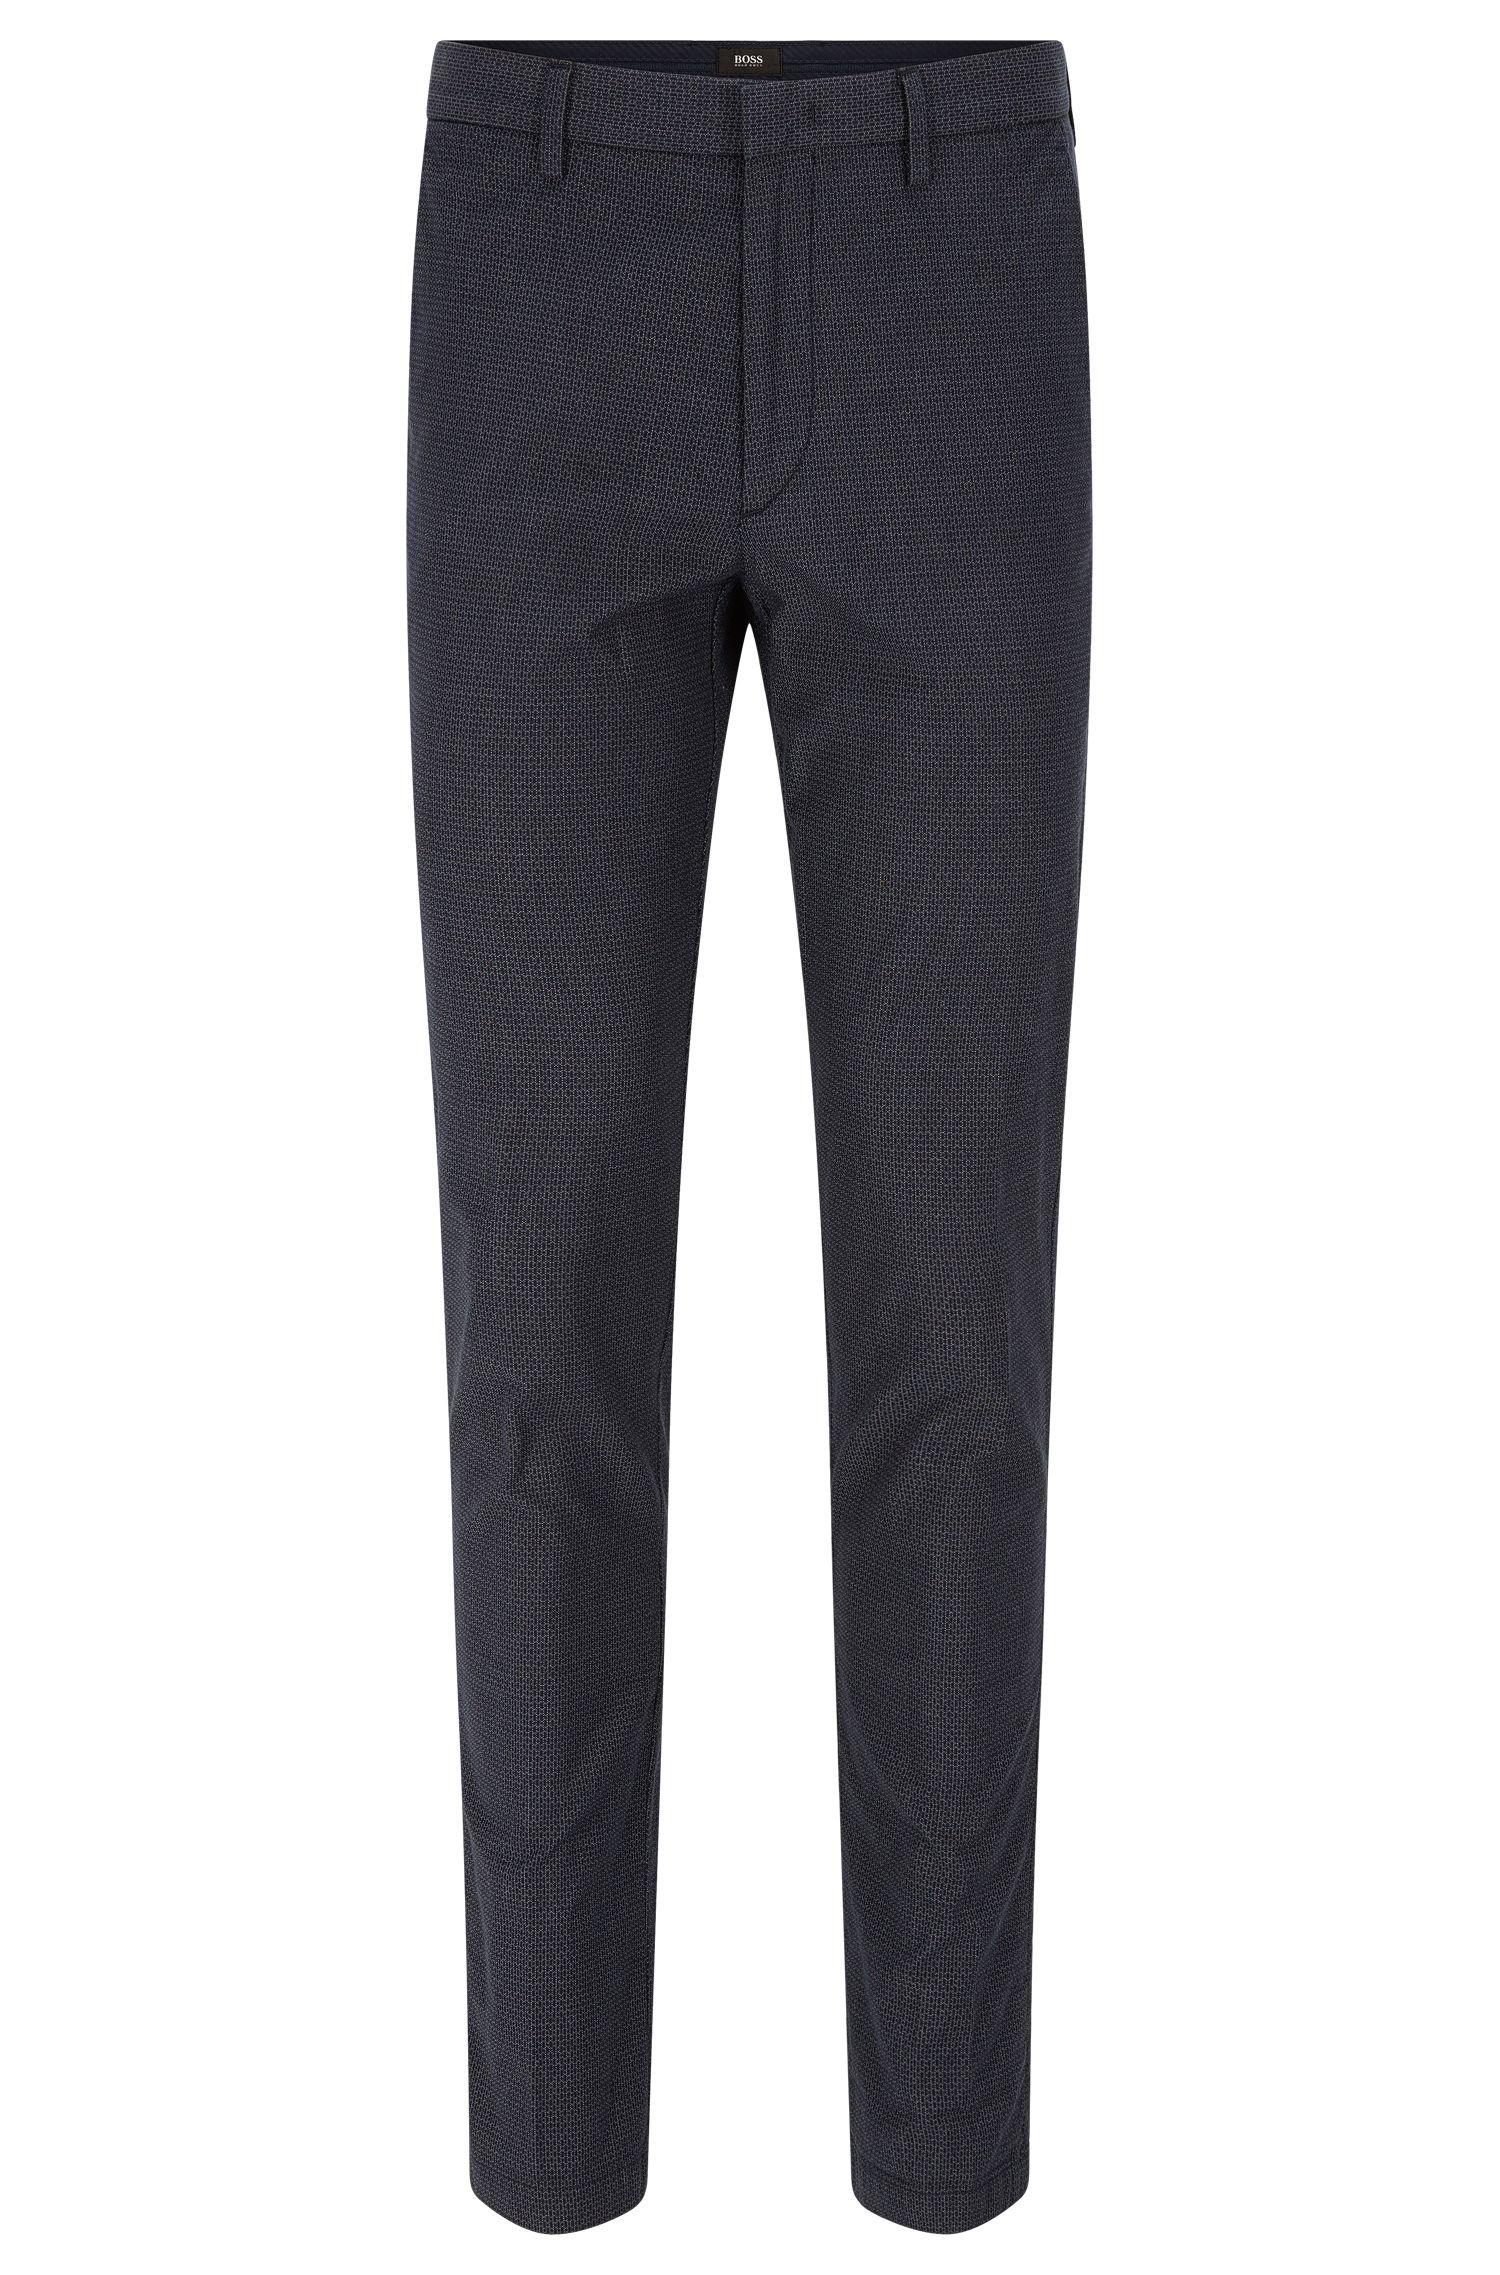 Geometric Stretch Cotton Chino Pants, Slim Fit   Kaito W